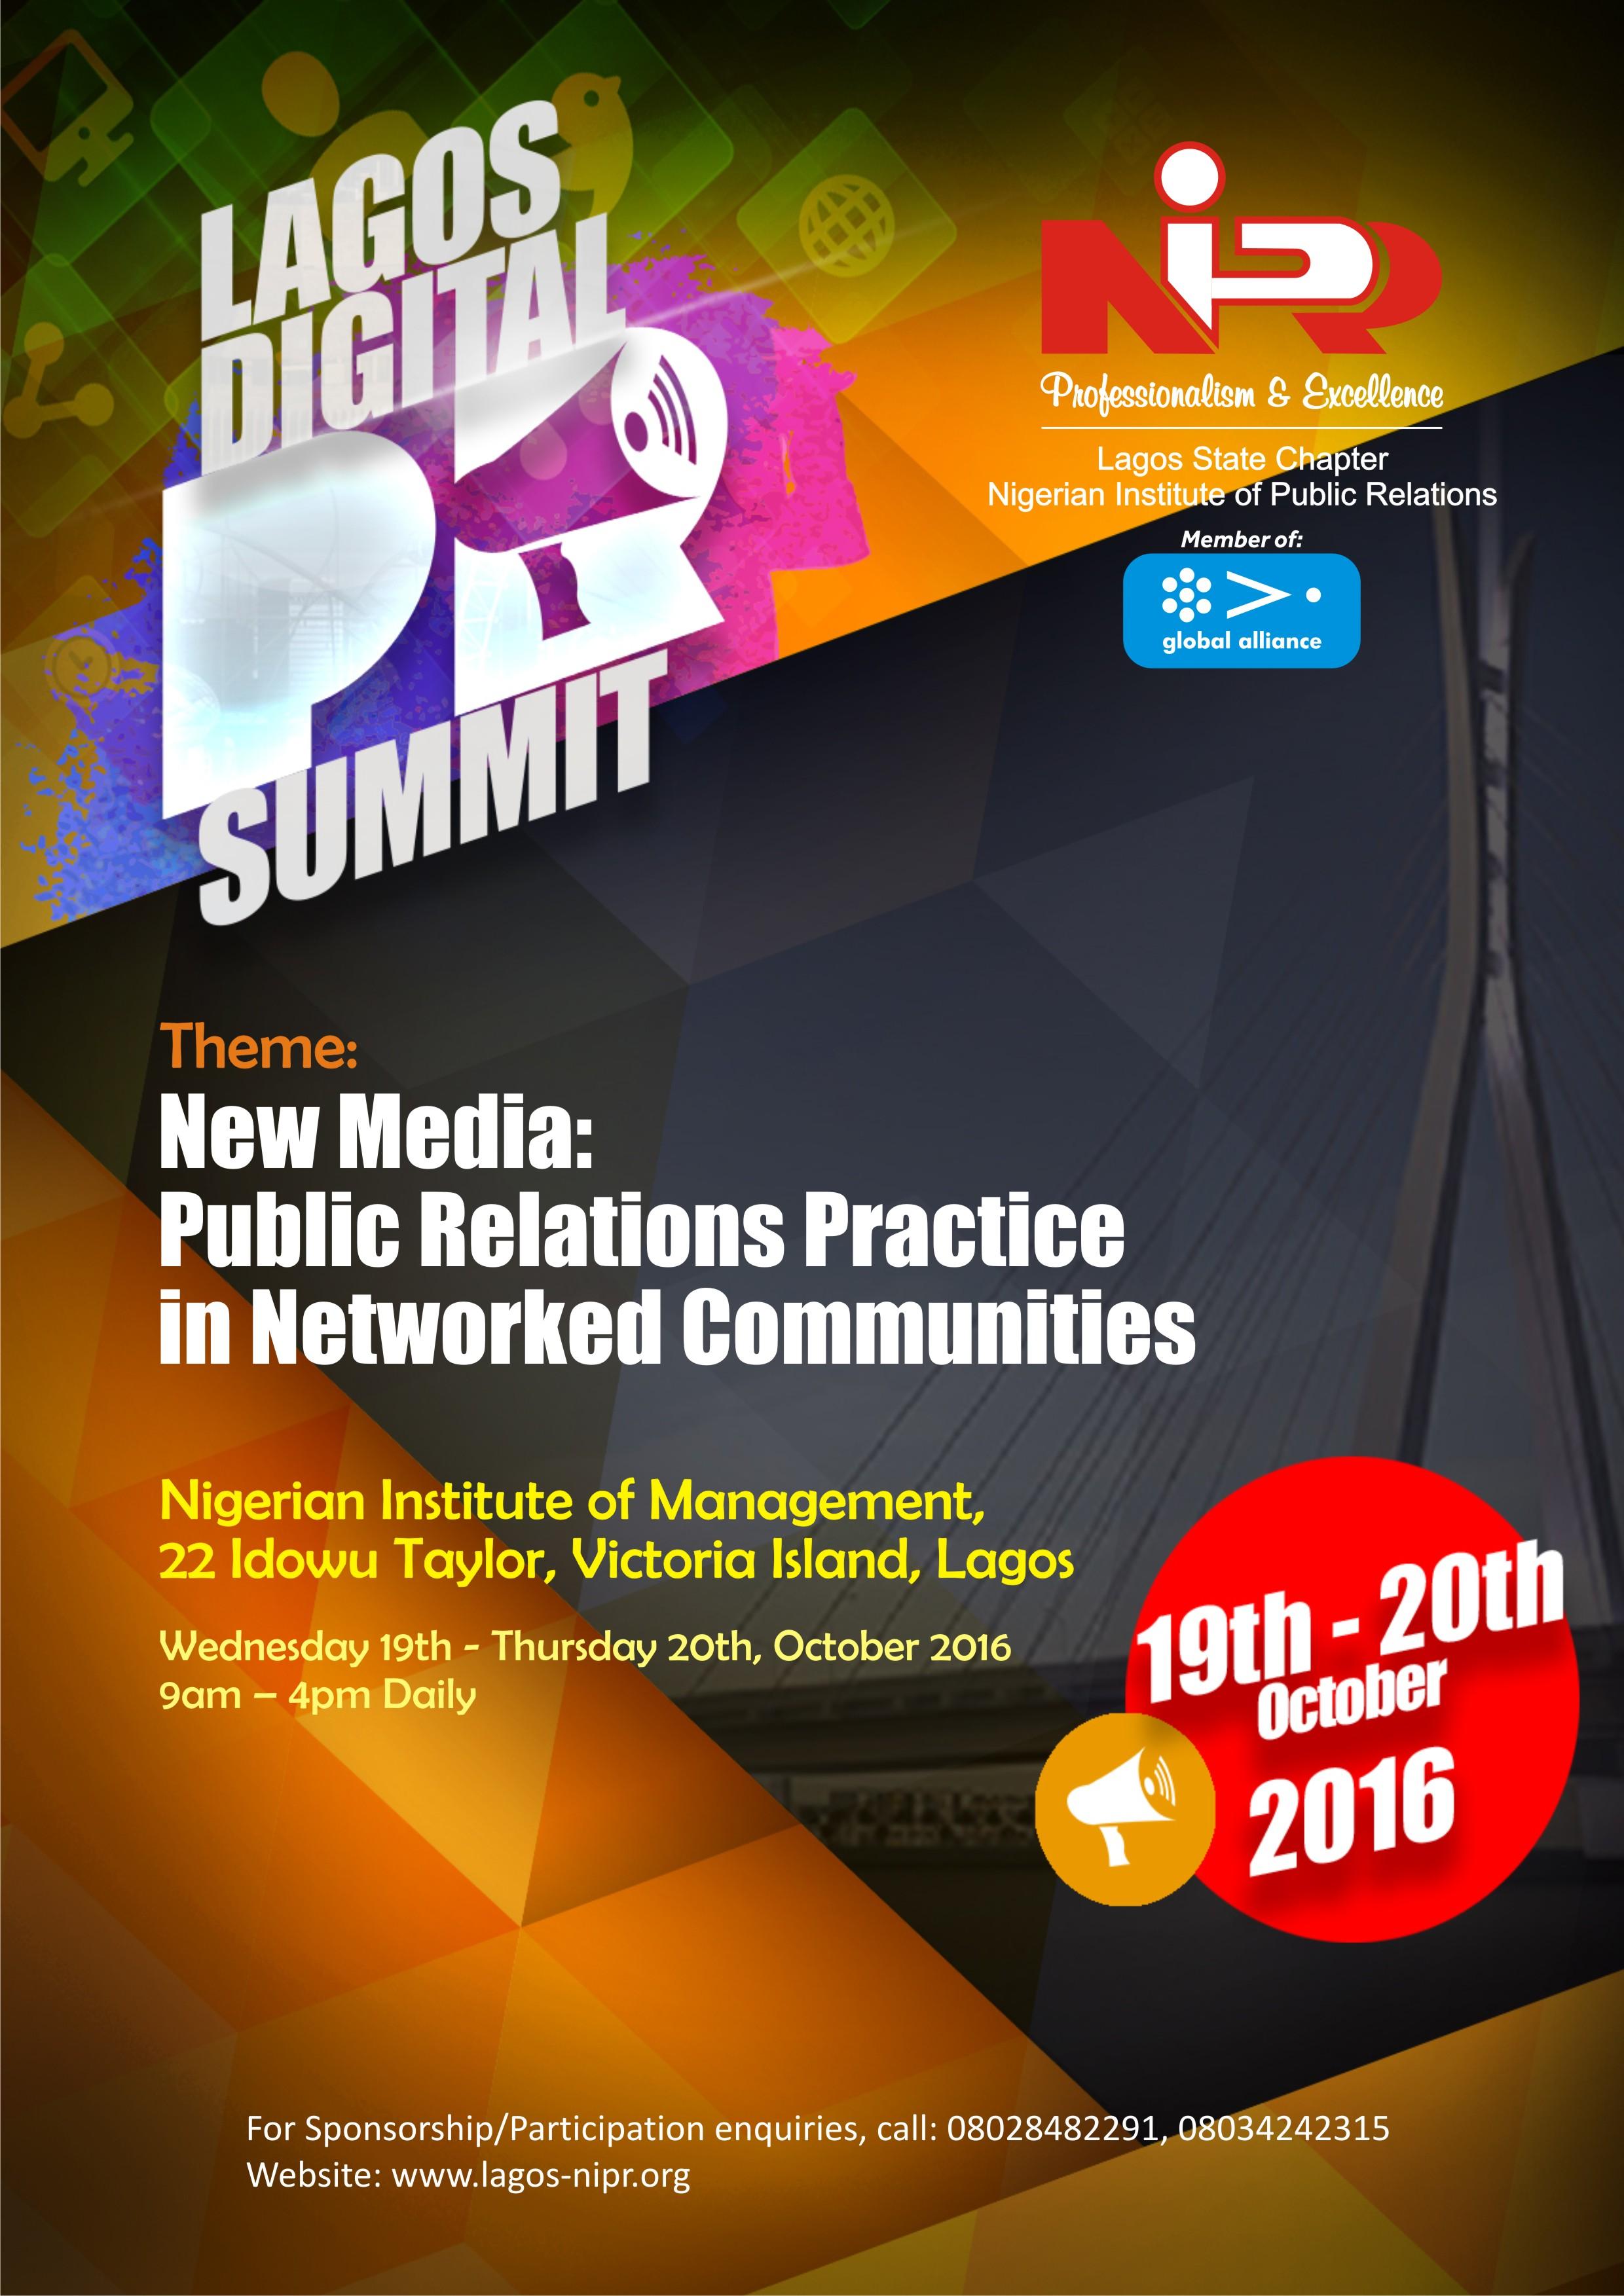 lagos_digital_pr_summit